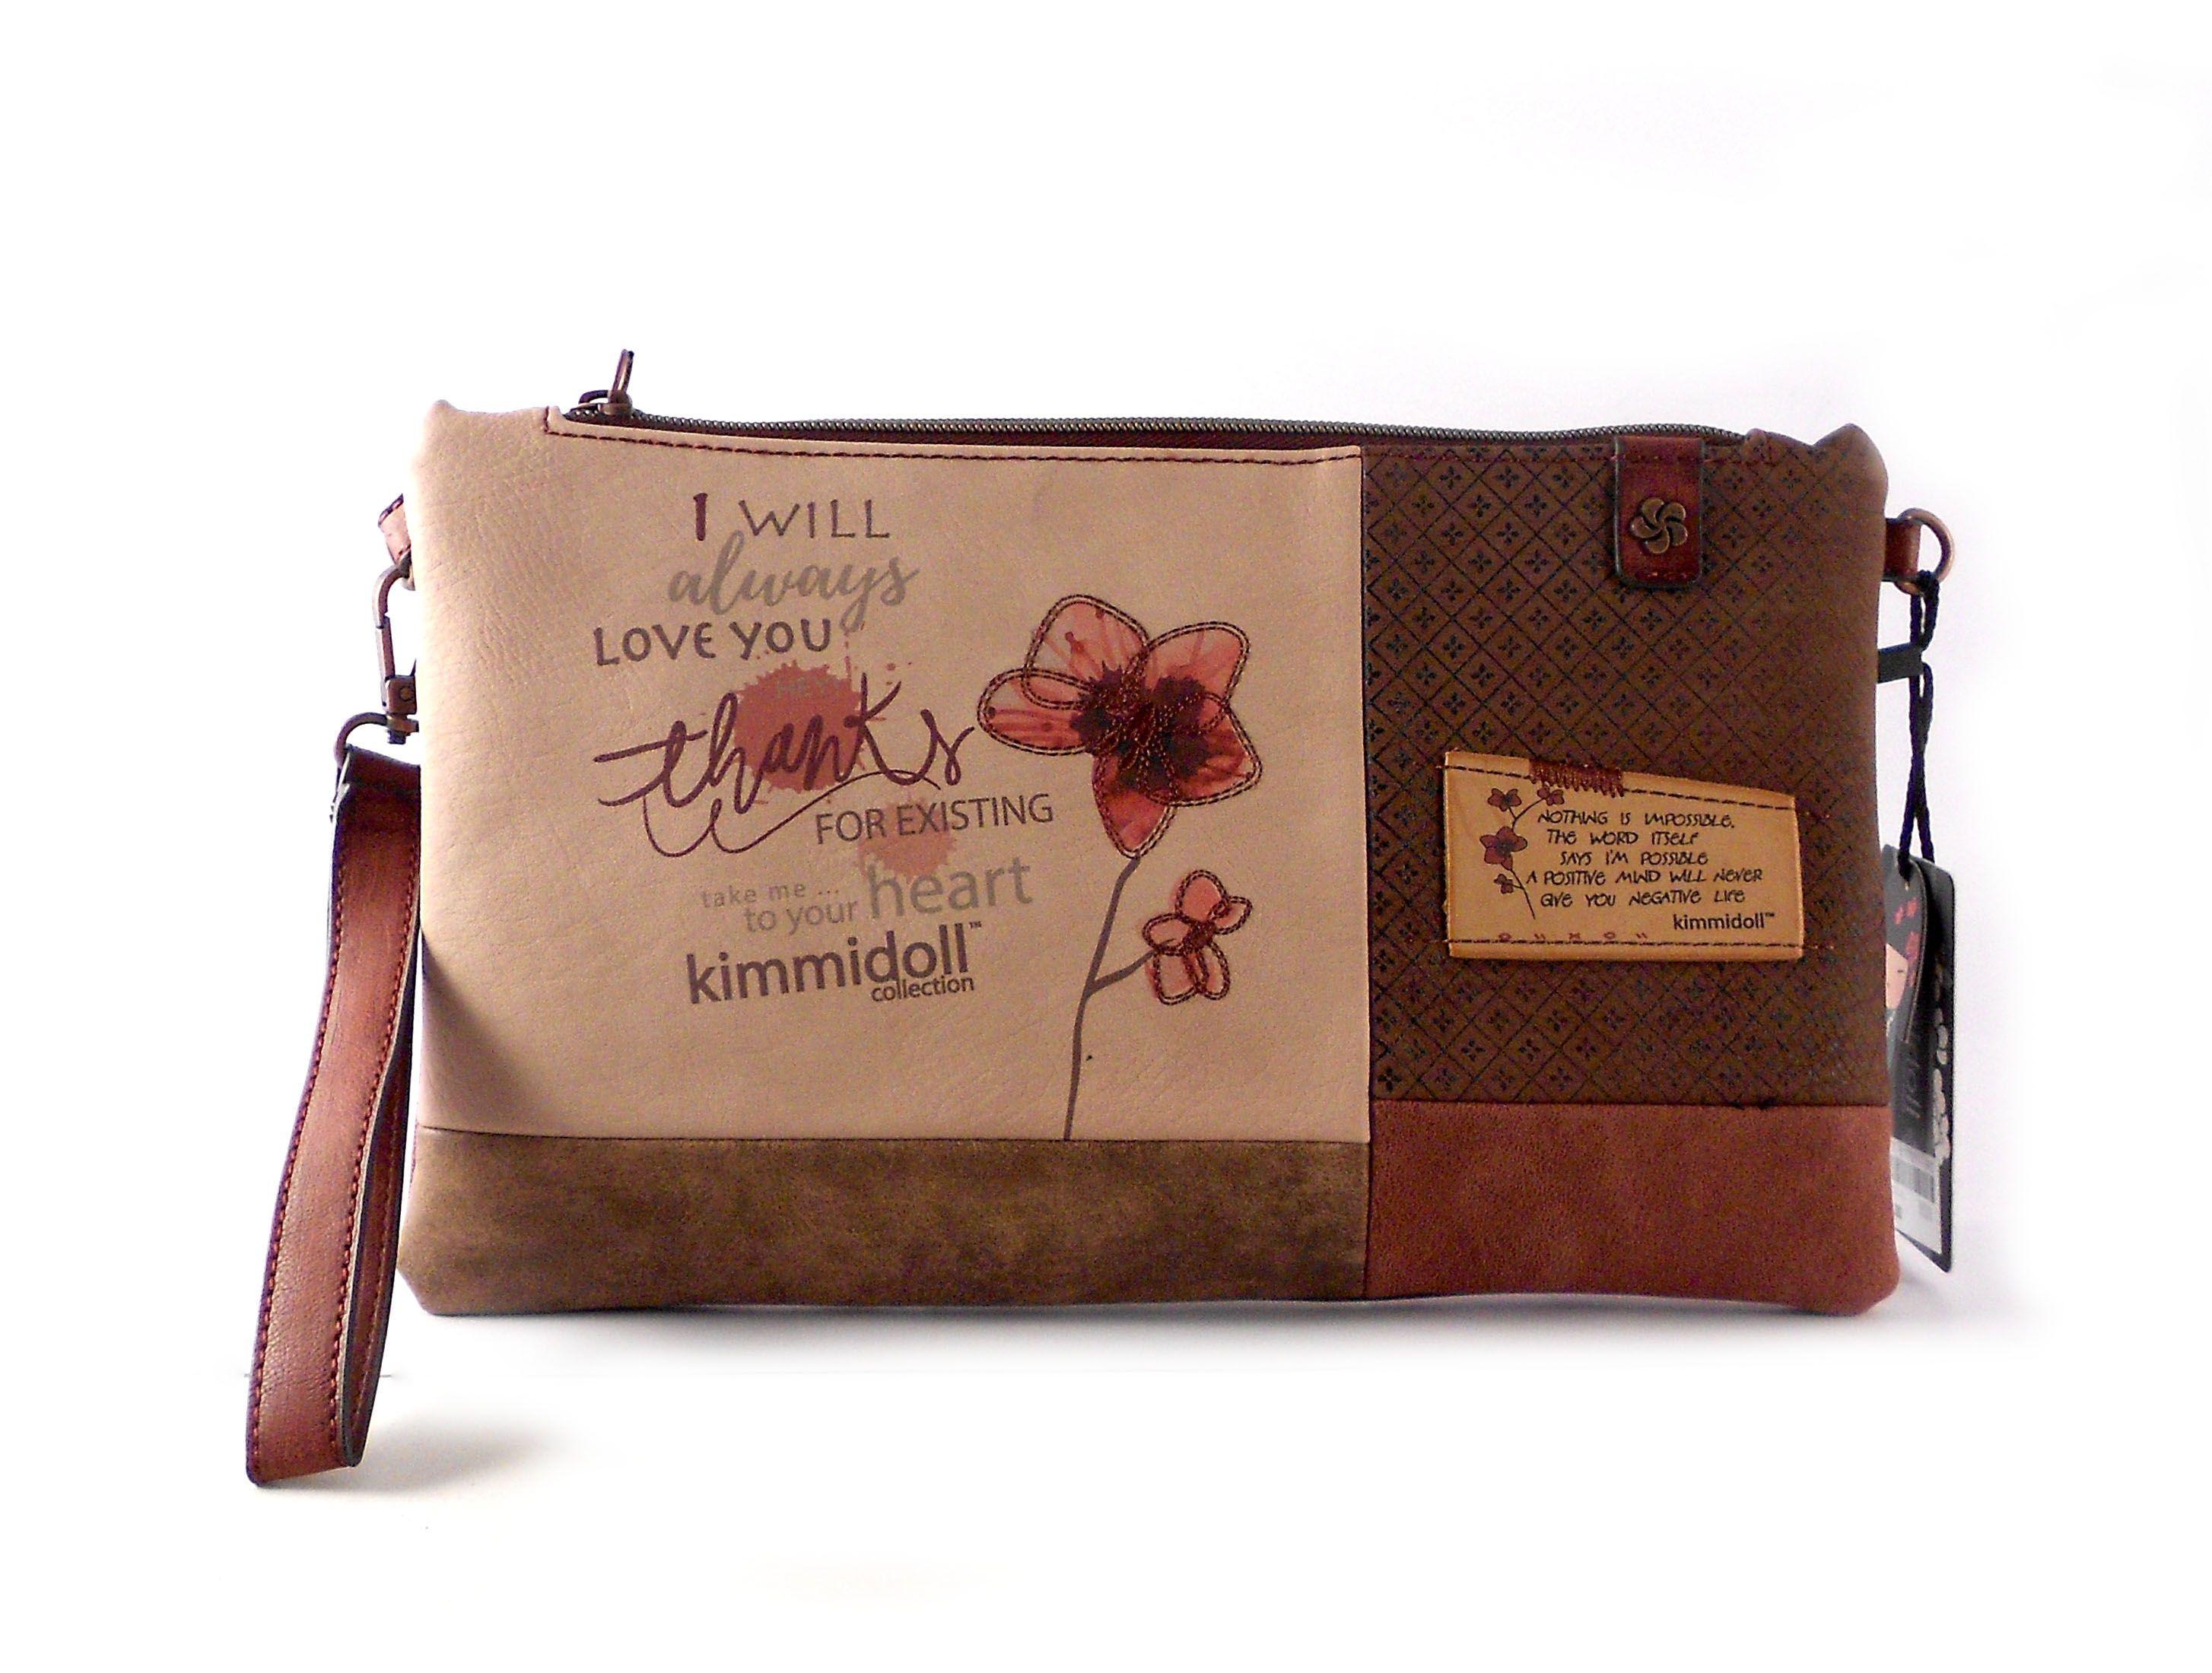 Bandolera Kimmidoll floral print marrón